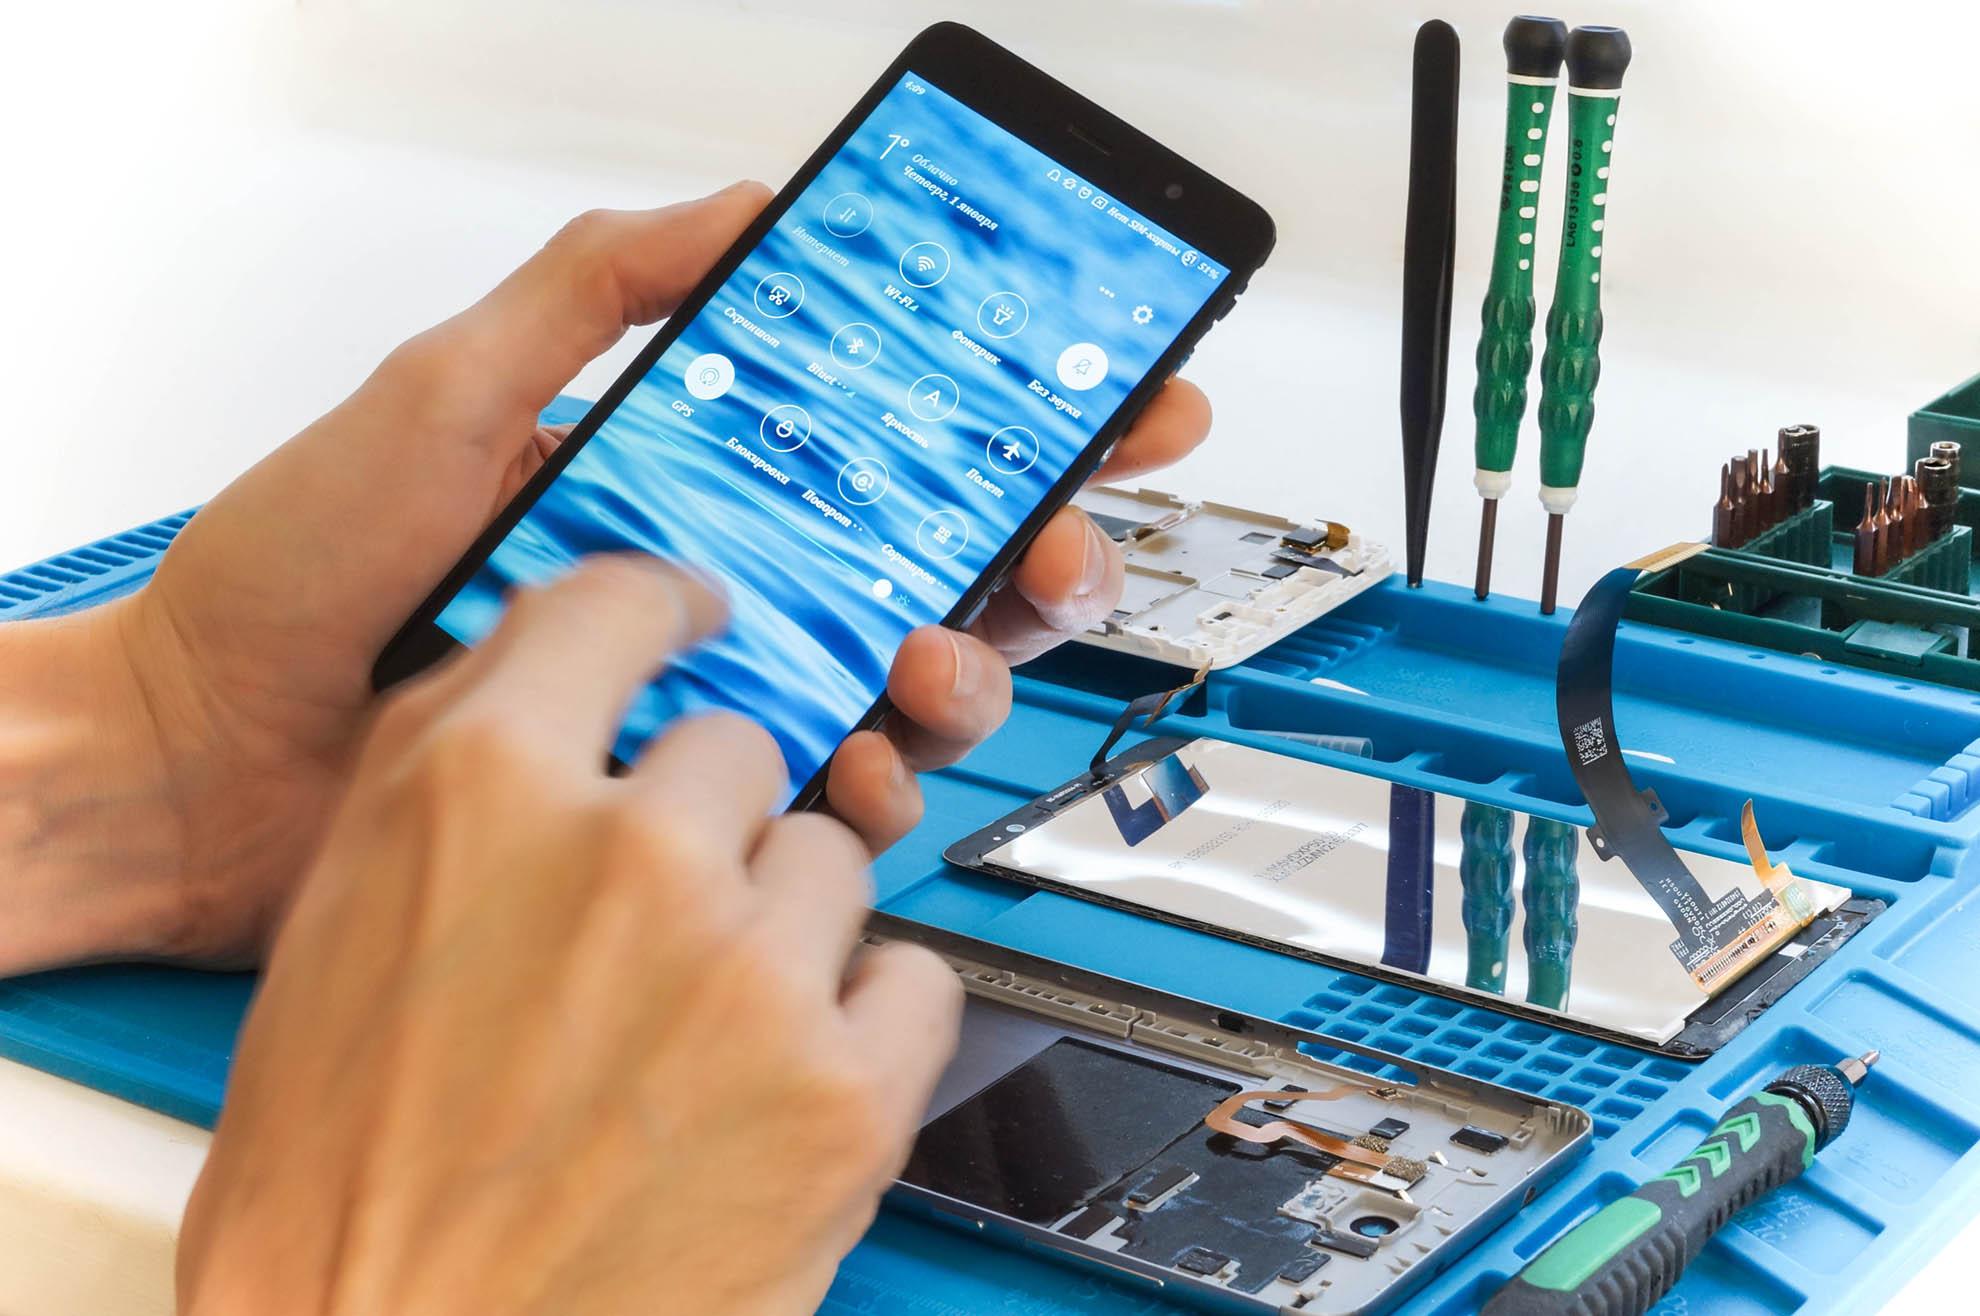 LAPTOP.RE Ремонт прошивка замена экрана смартфонов Xiaomi, ZTE, Meizu, Lenovo, Iphone, Huawei, Asus, и других в Барановичах